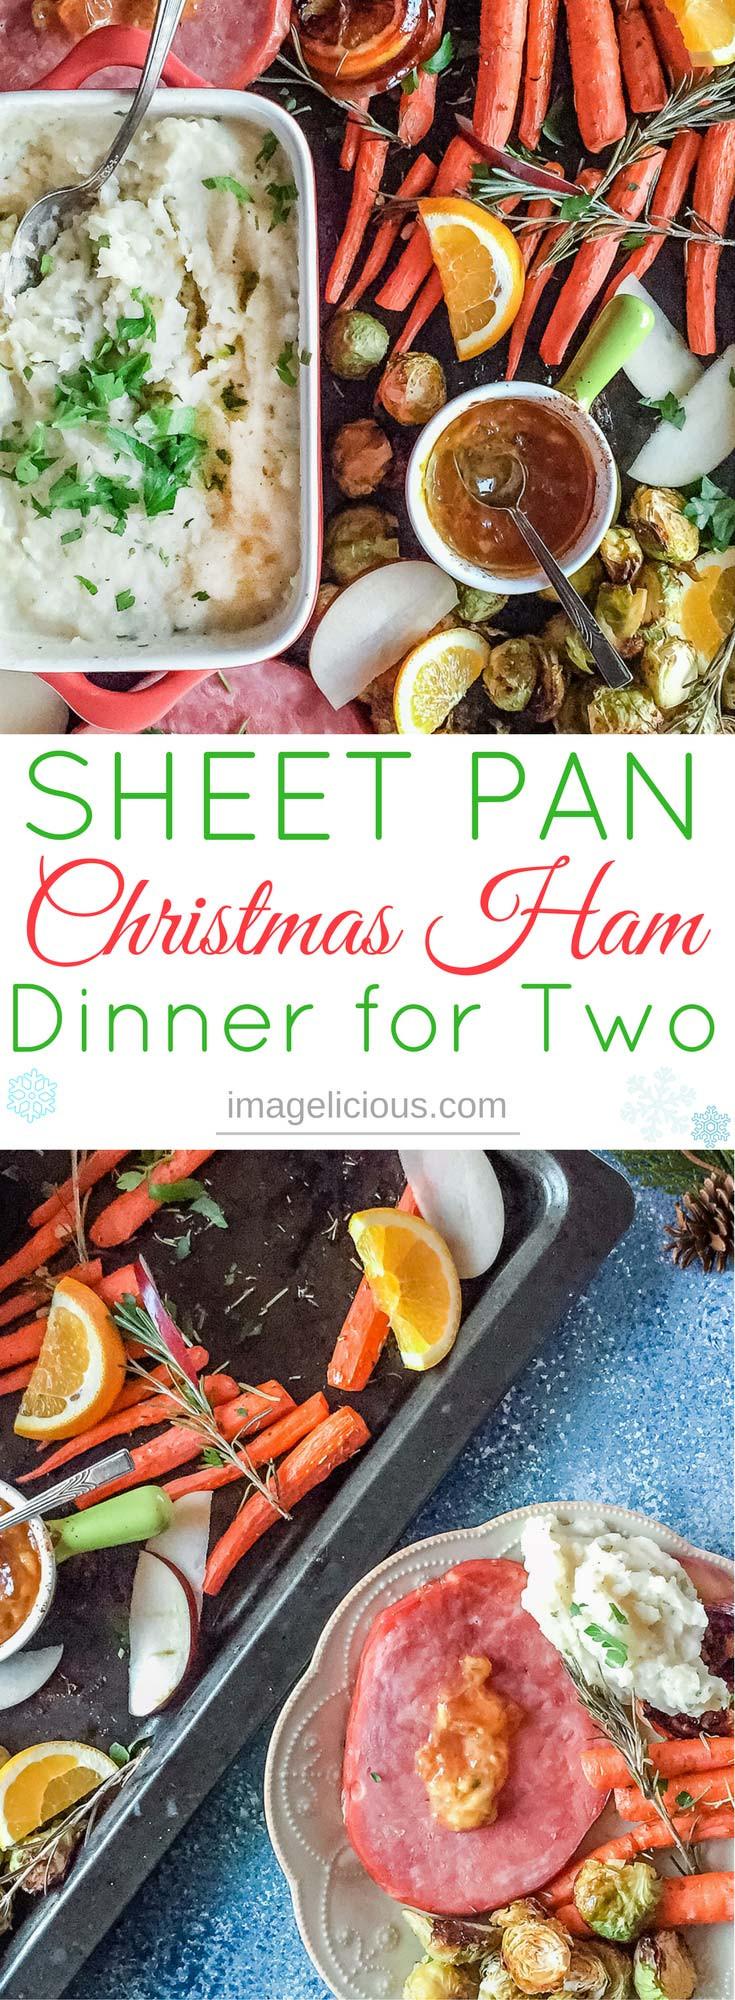 Christmas Dinner For Two  Sheet Pan Christmas Ham Dinner For Two Imagelicious